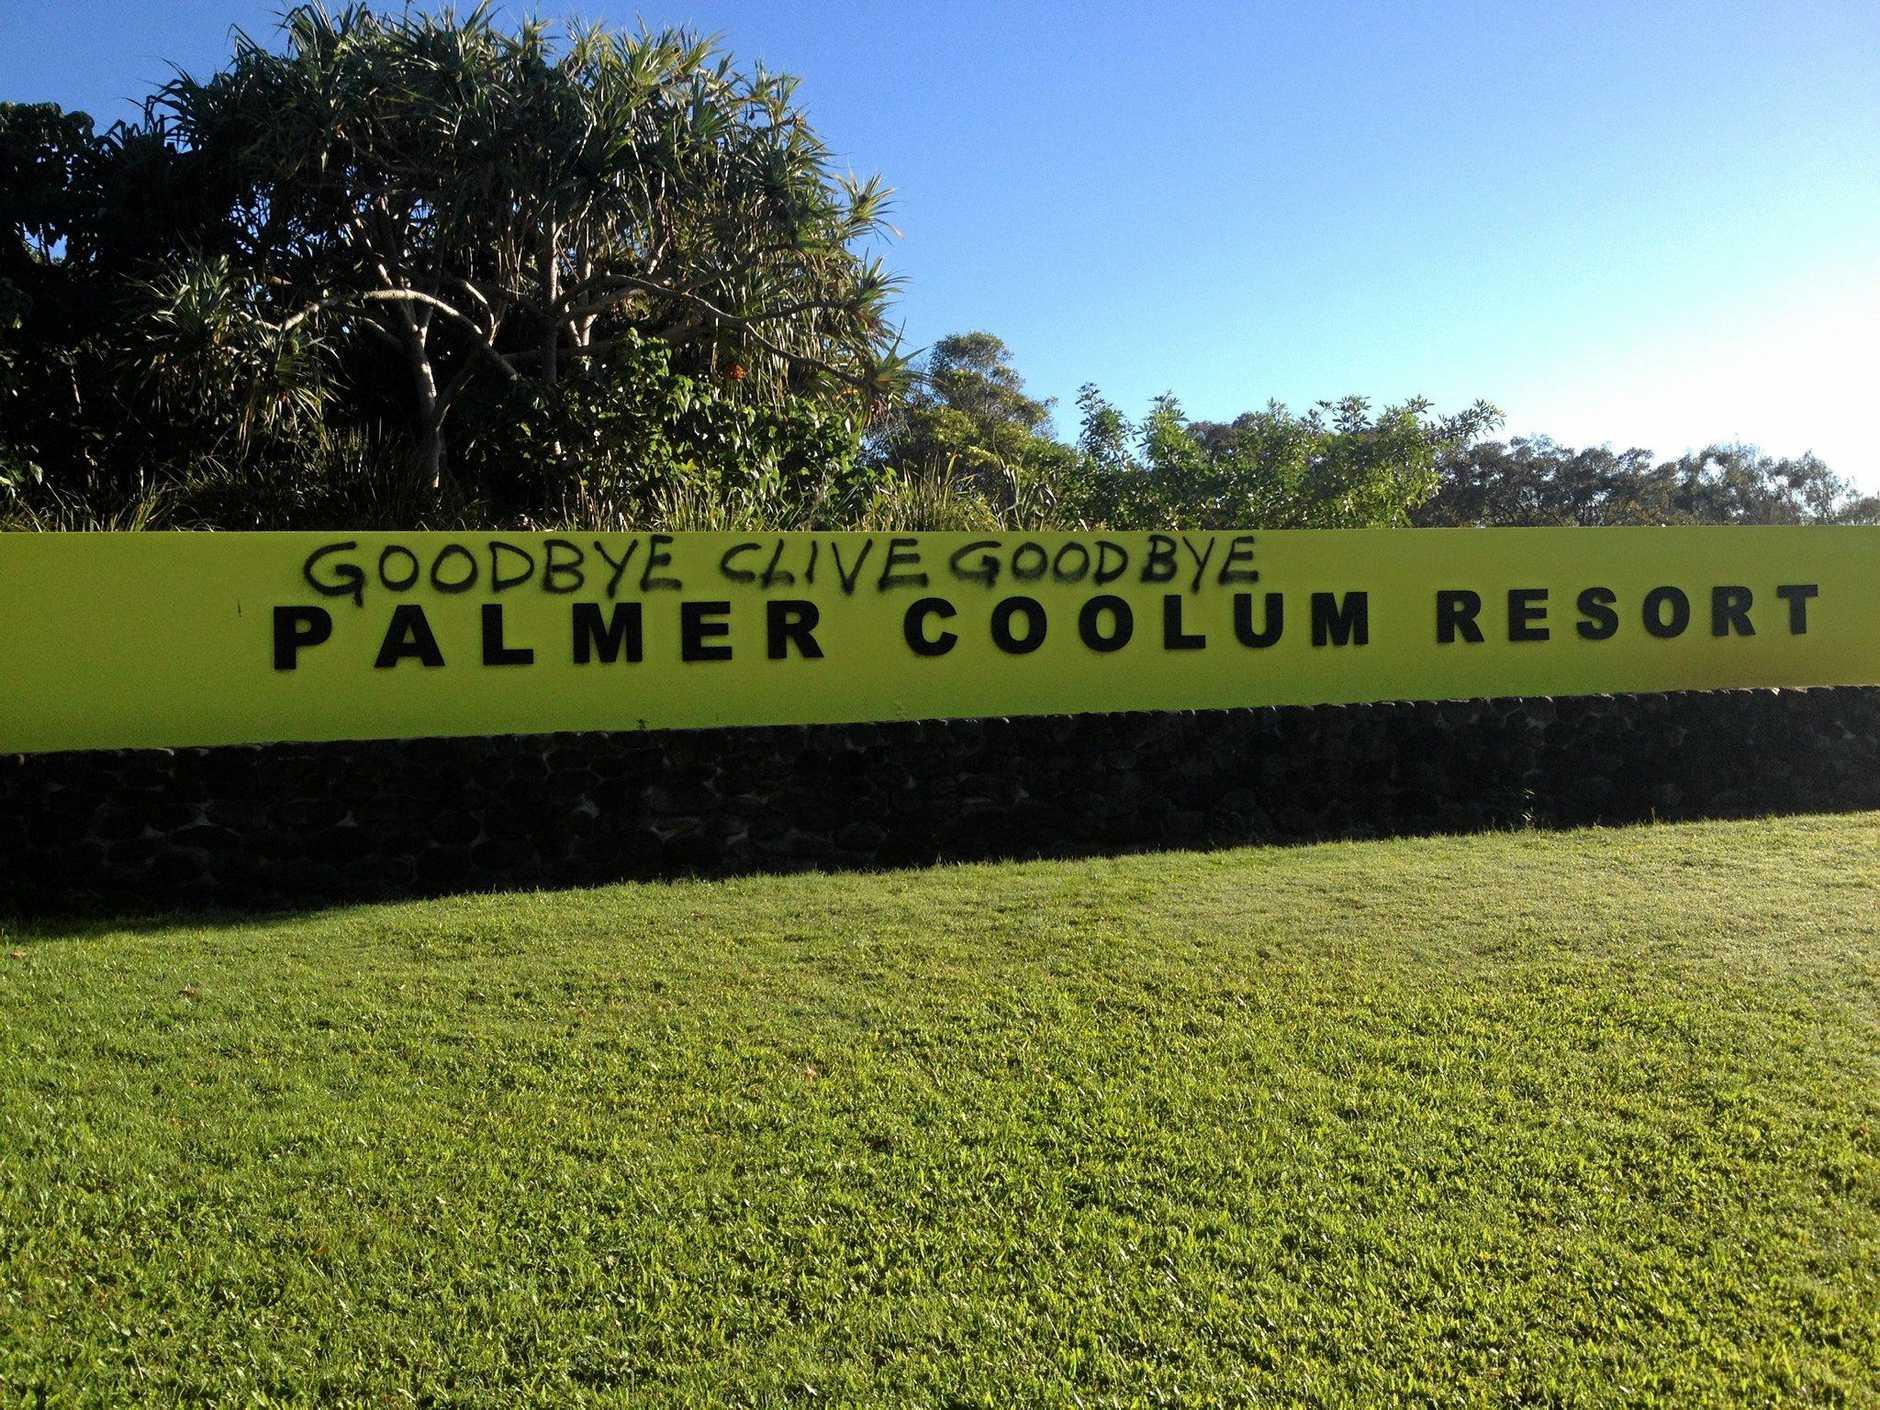 Goodbye Clive goodbye': Graffiti sends message to Palmer